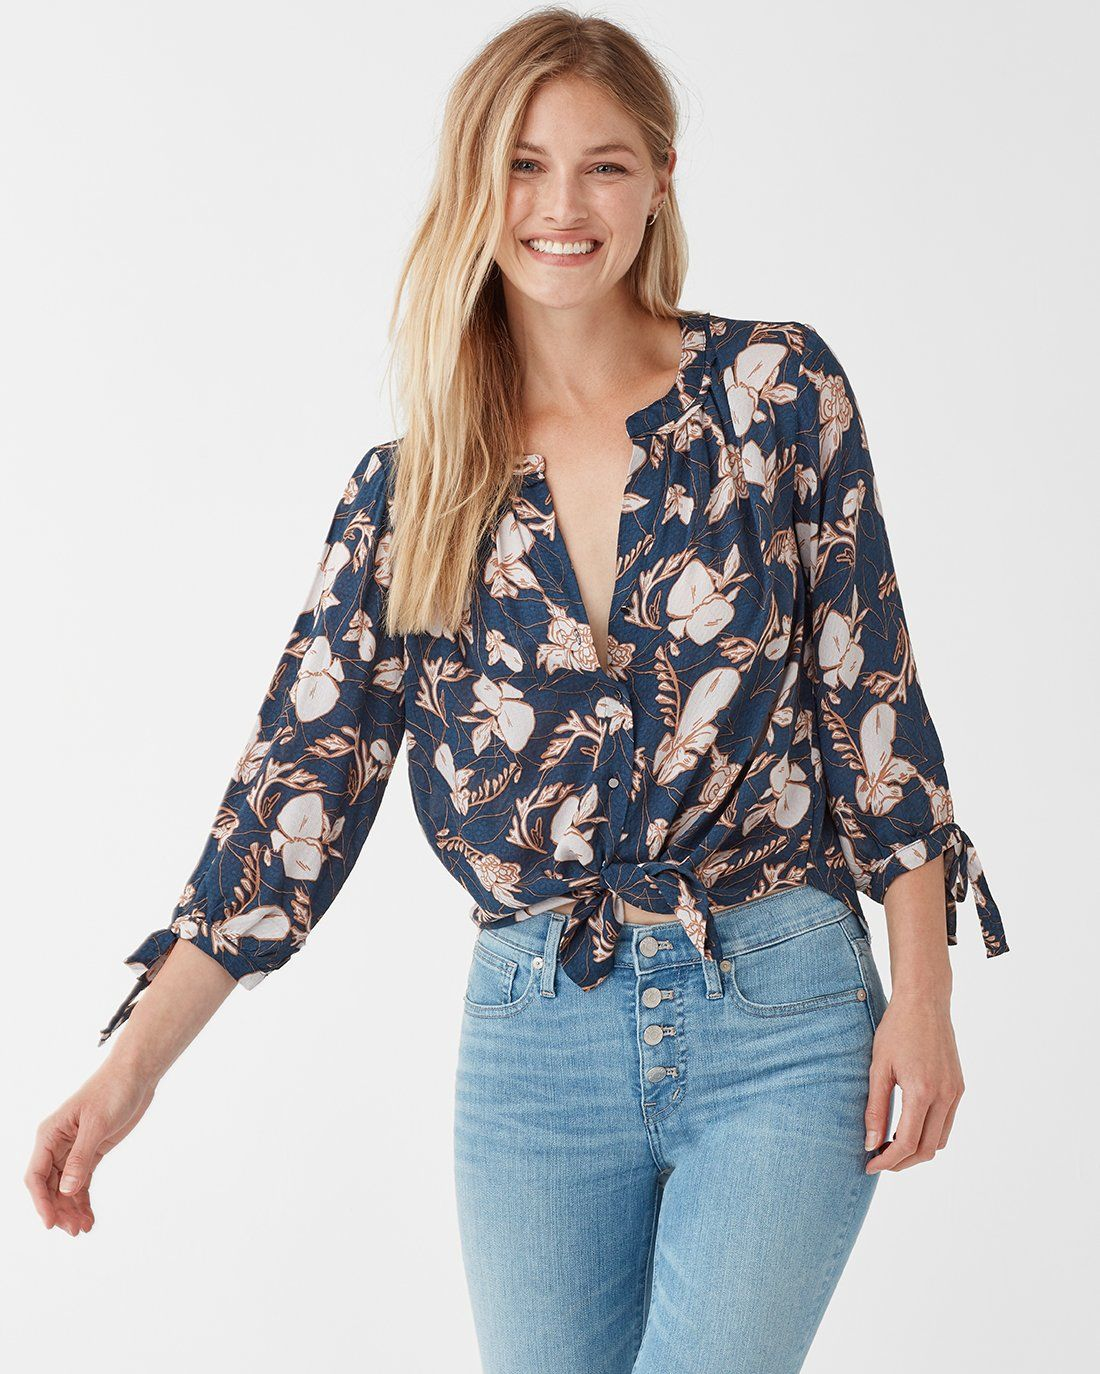 dbea3a2db061c Ramo Floral Print Tie Sleeve Blouse